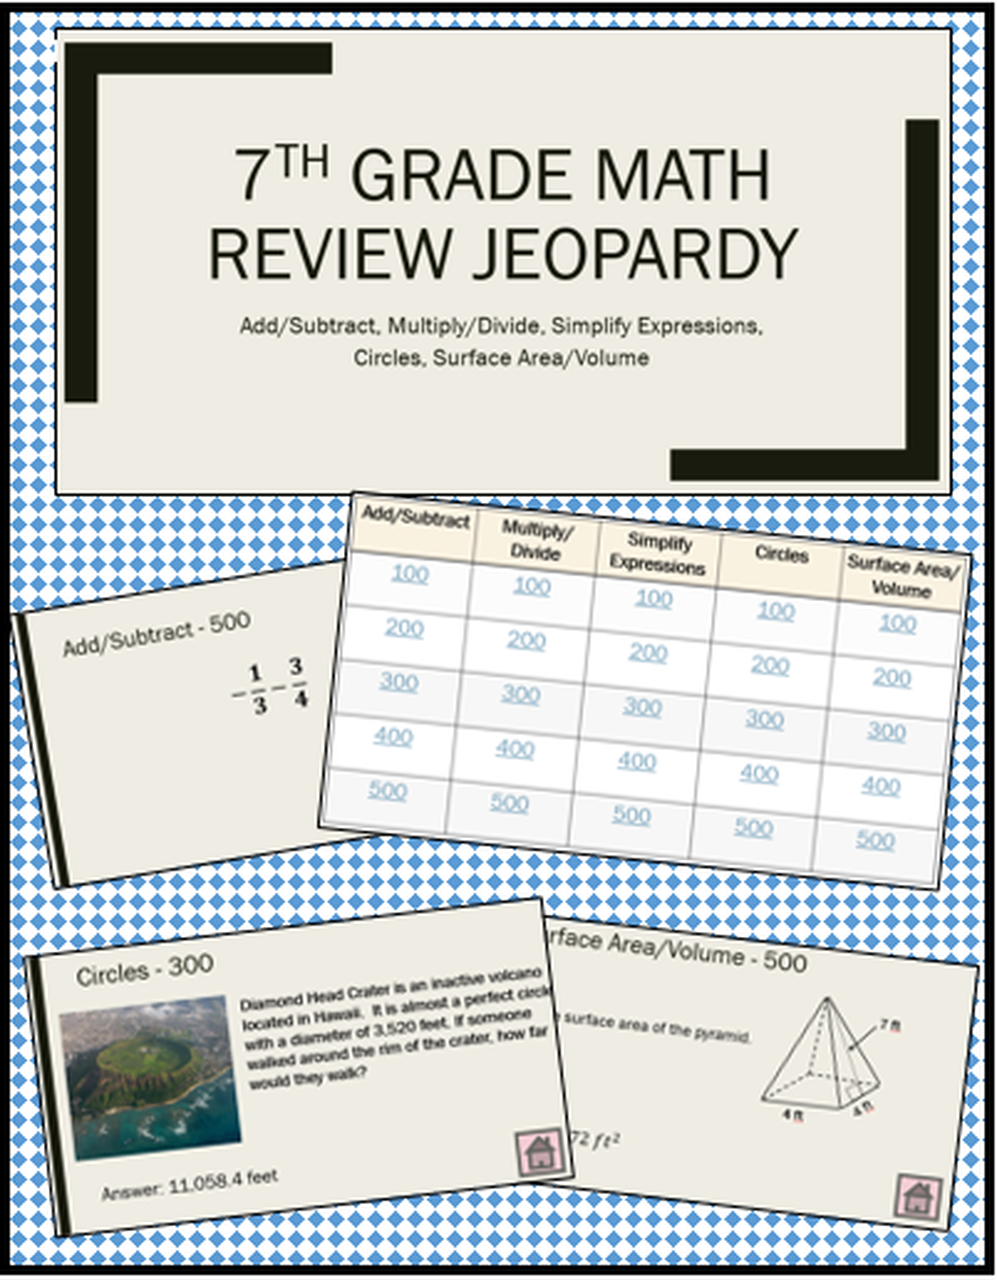 7th Grade Math Review Jeopardy Game 7th Grade Math Math Review Math [ 1280 x 997 Pixel ]